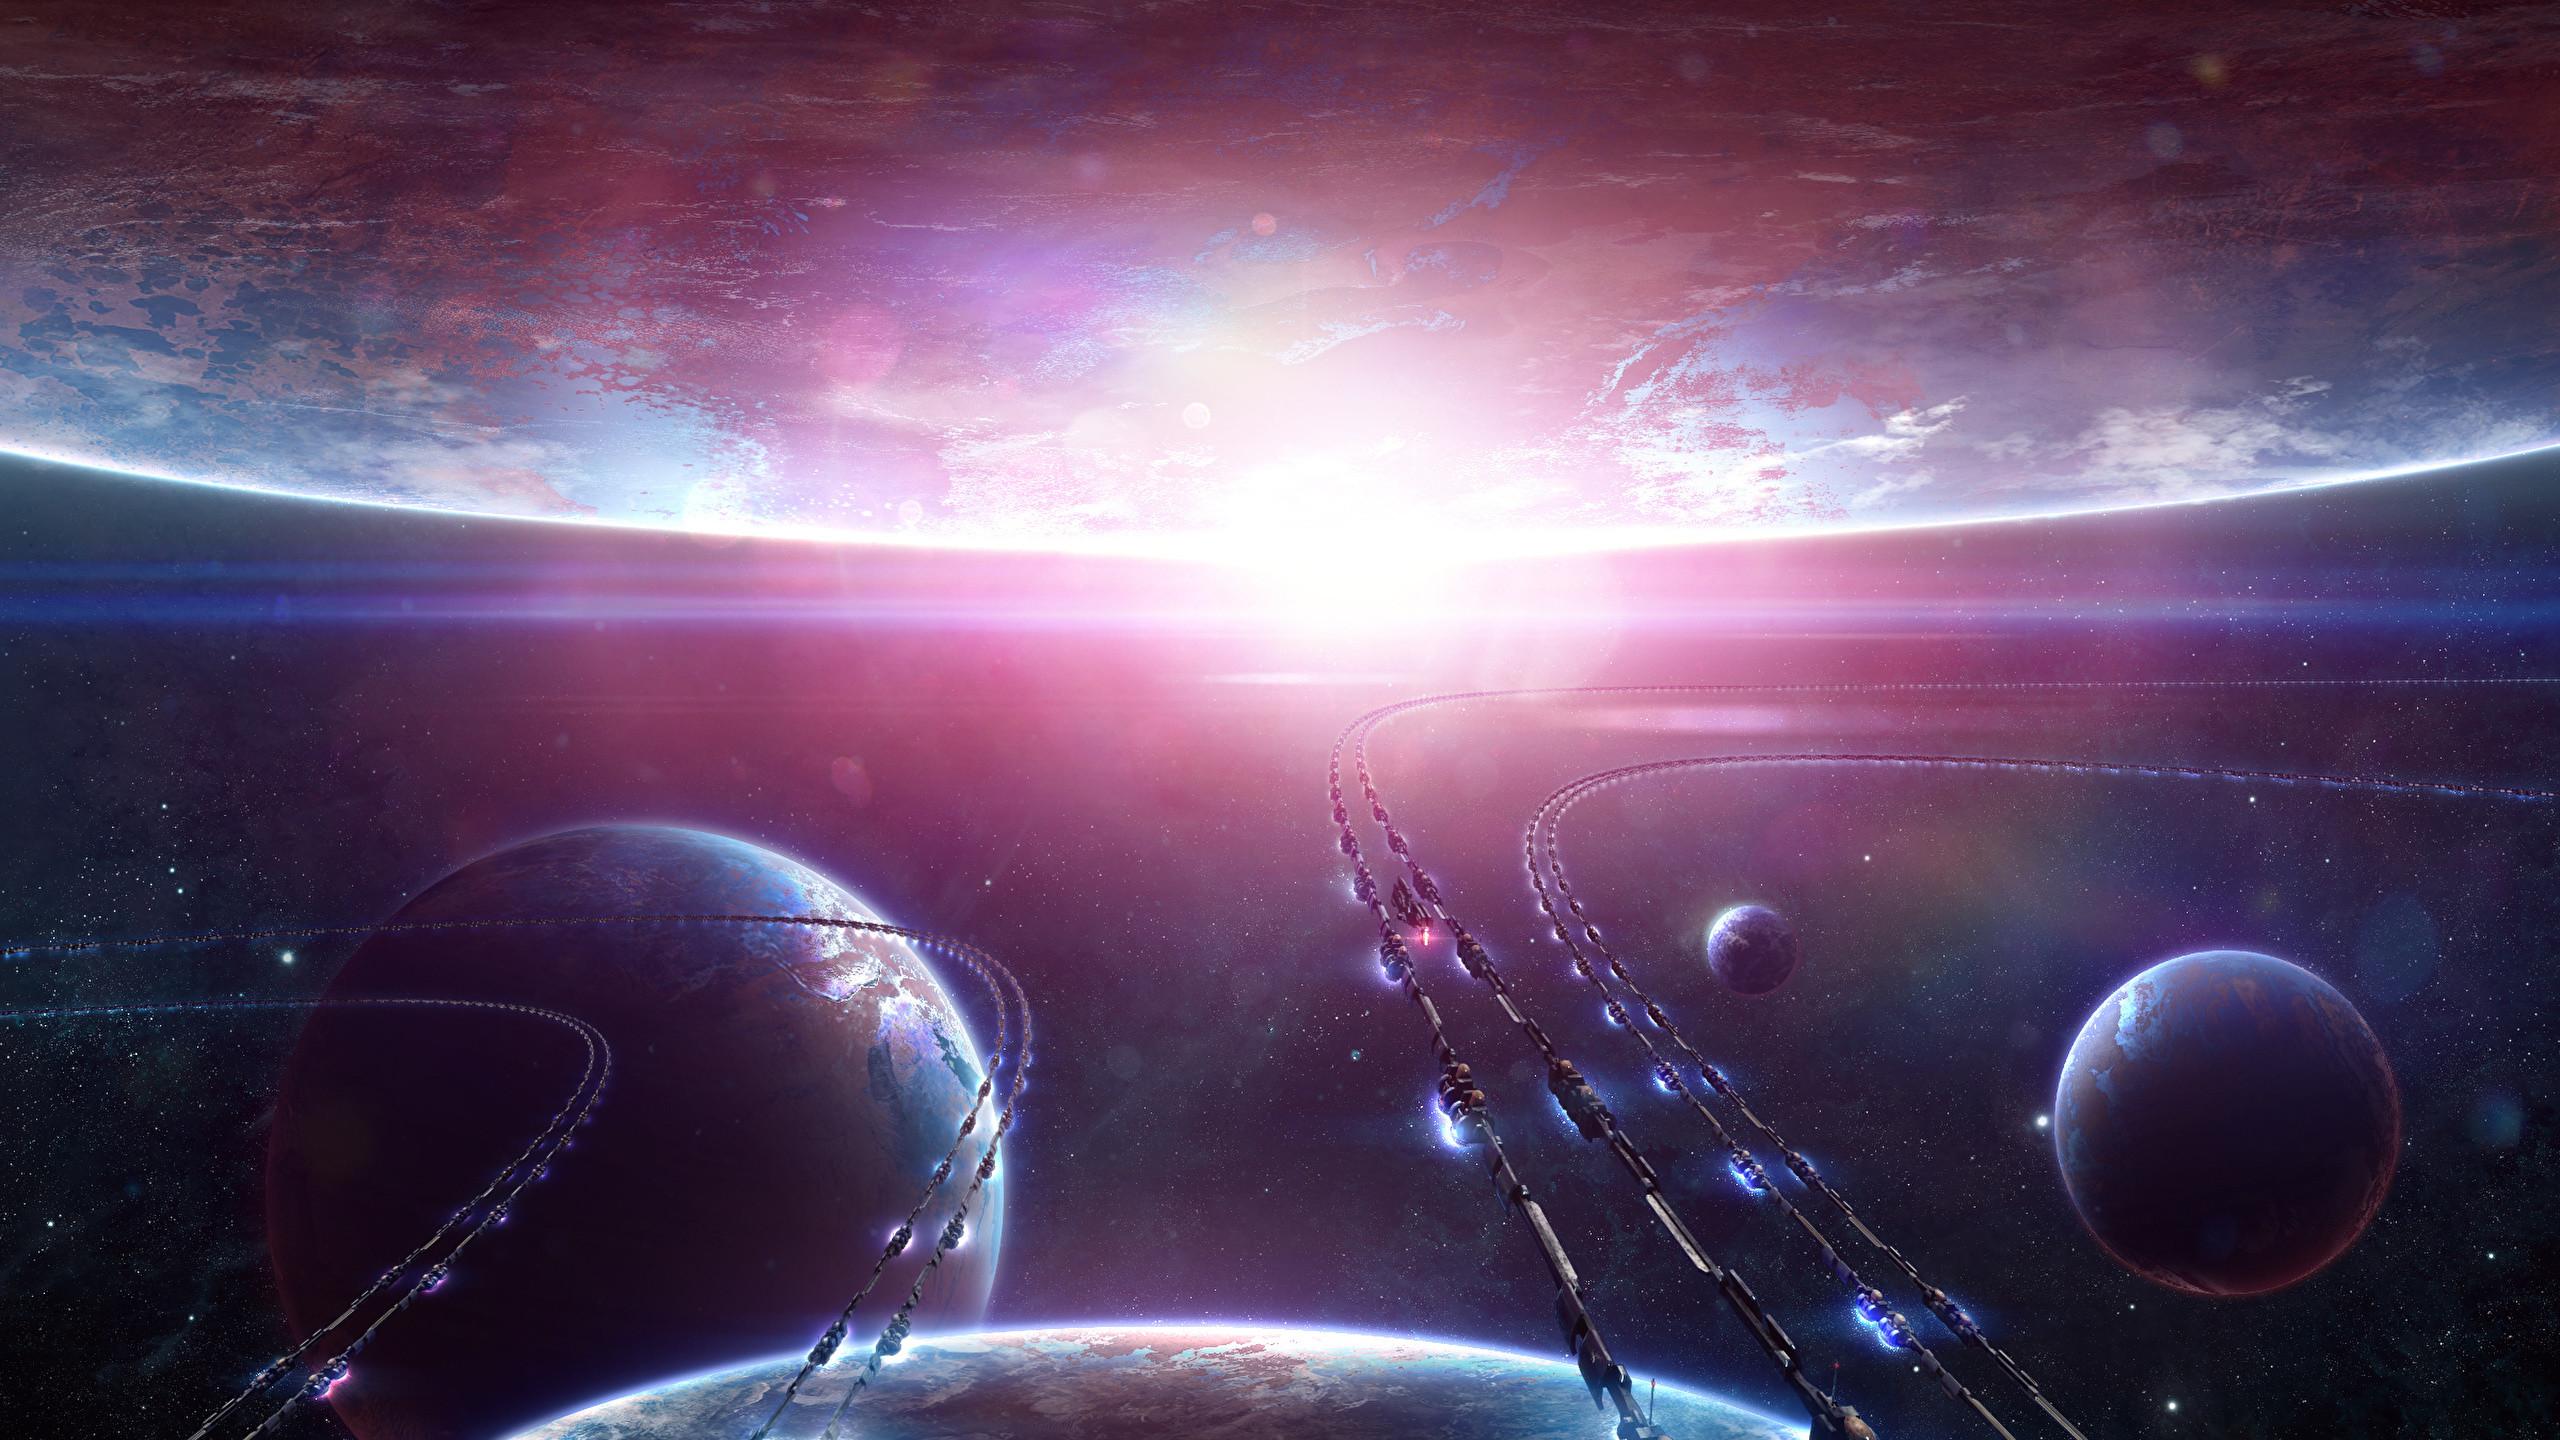 Images Planets Space Fantasy Technics Fantasy 2560×1440